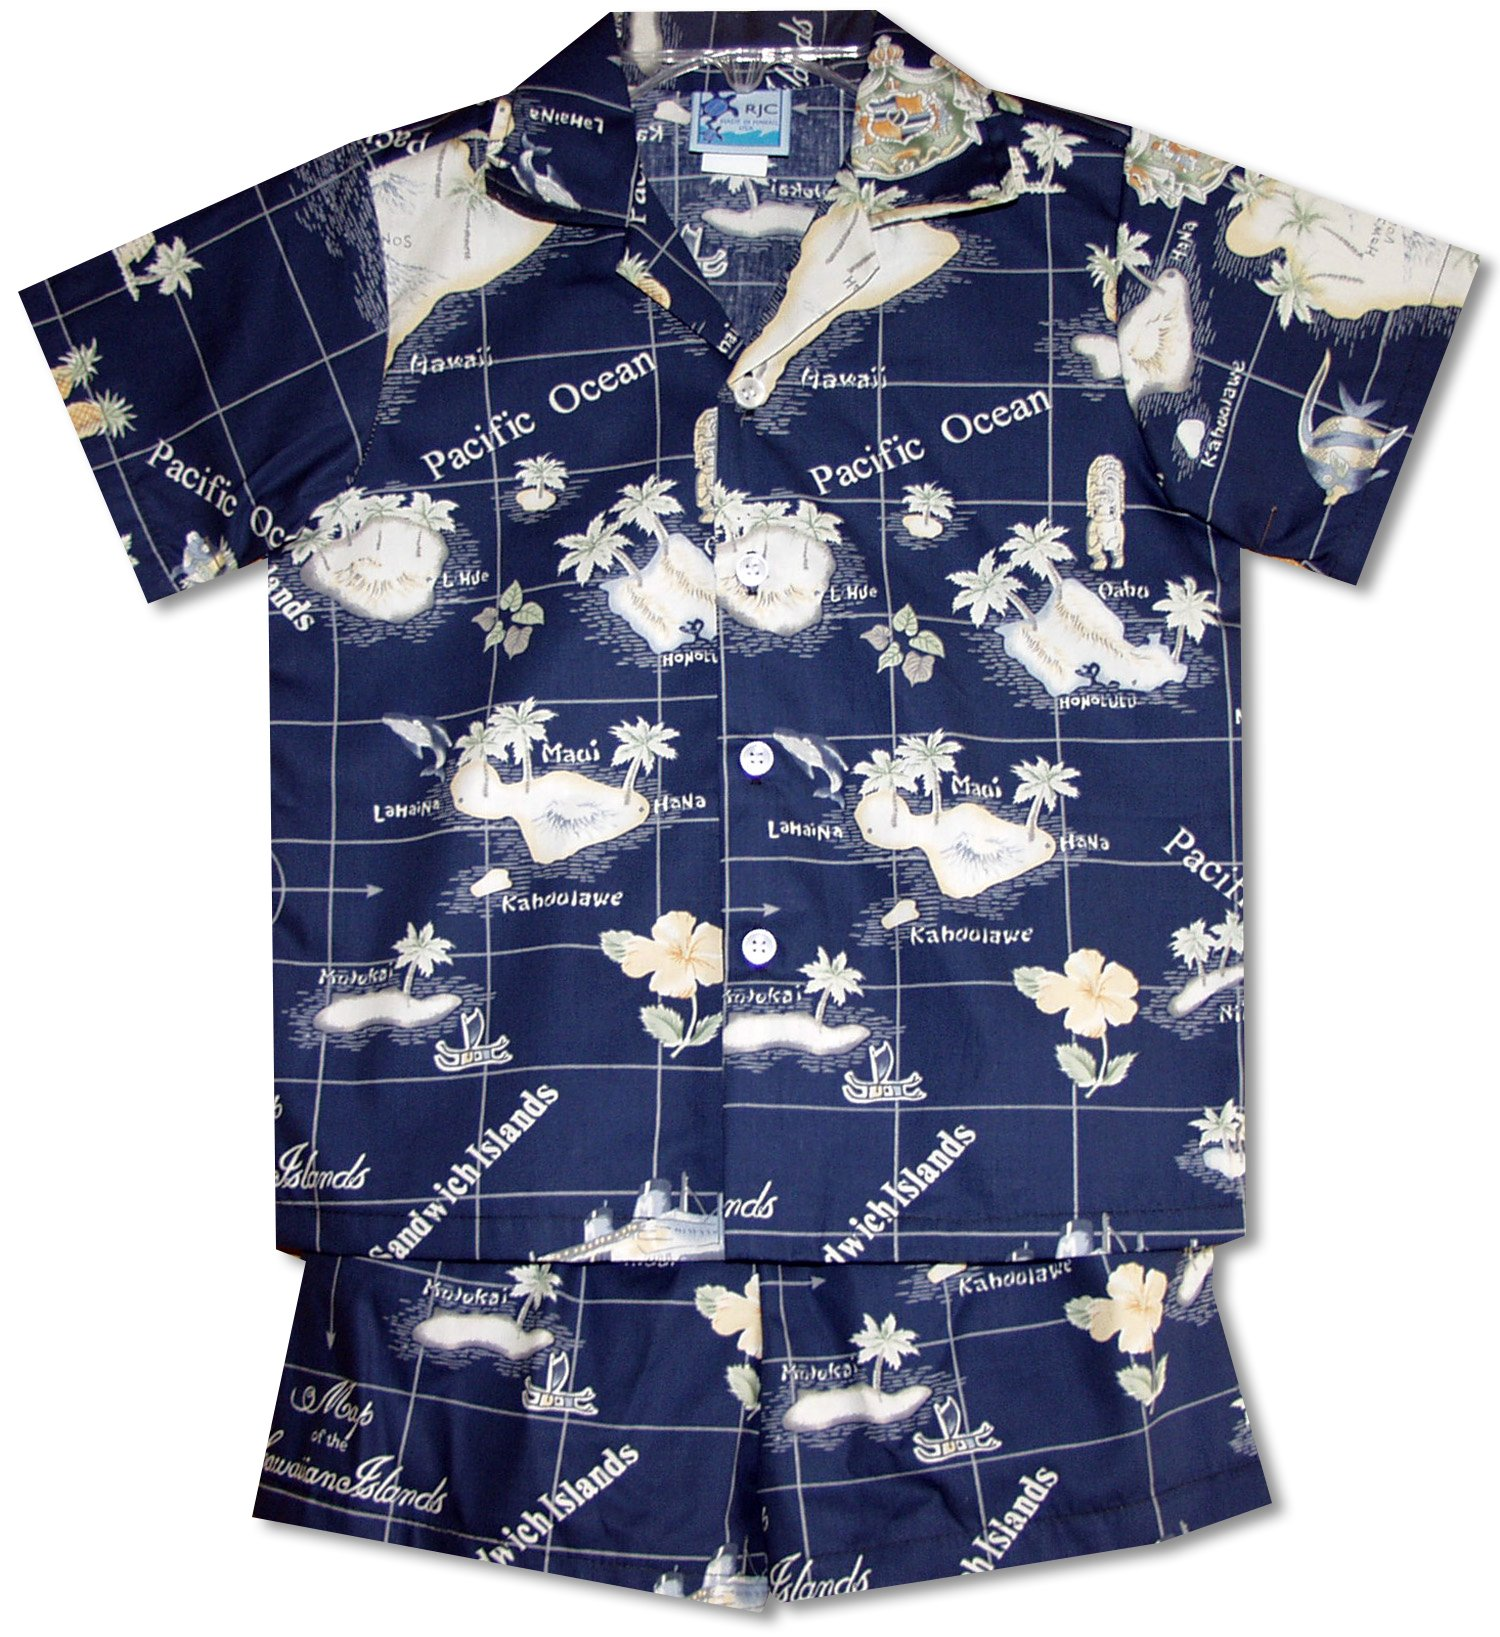 RJC Boys Hawaiian Island Paradise 2pc Set in Navy Blue - 18 Months